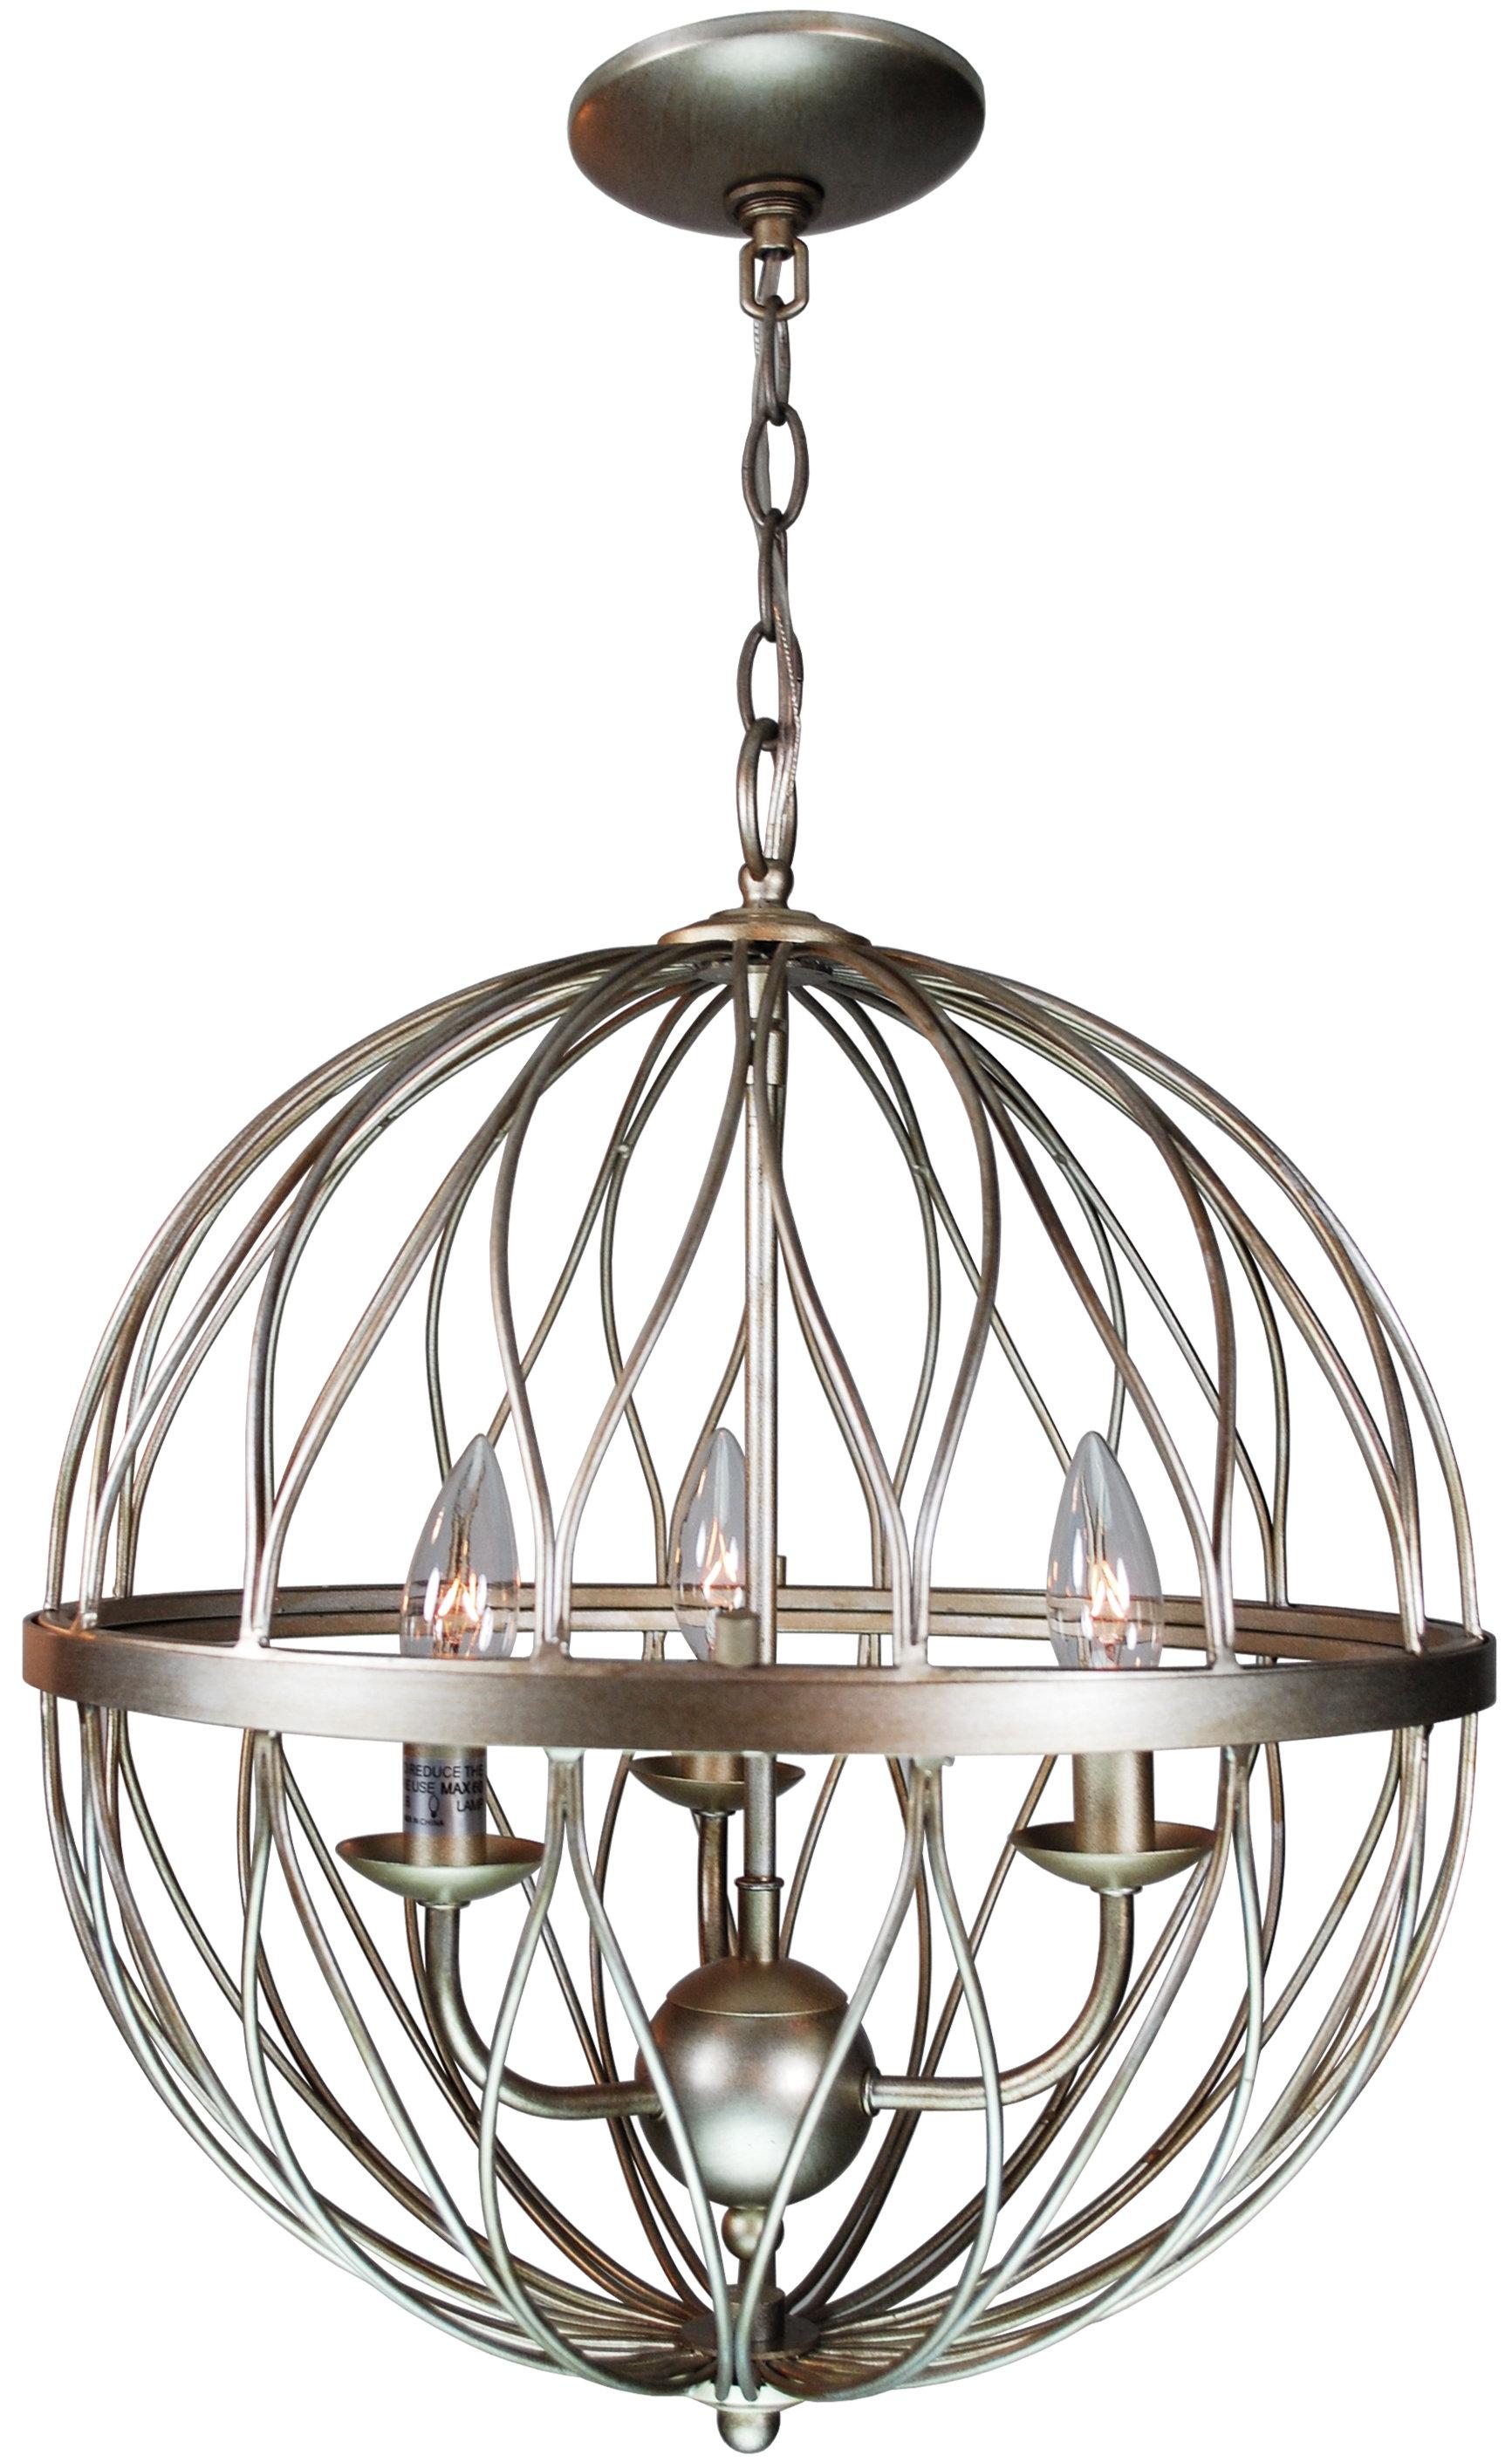 Brittain 3-Light Globe Chandelier for Shipststour 3-Light Globe Chandeliers (Image 5 of 30)